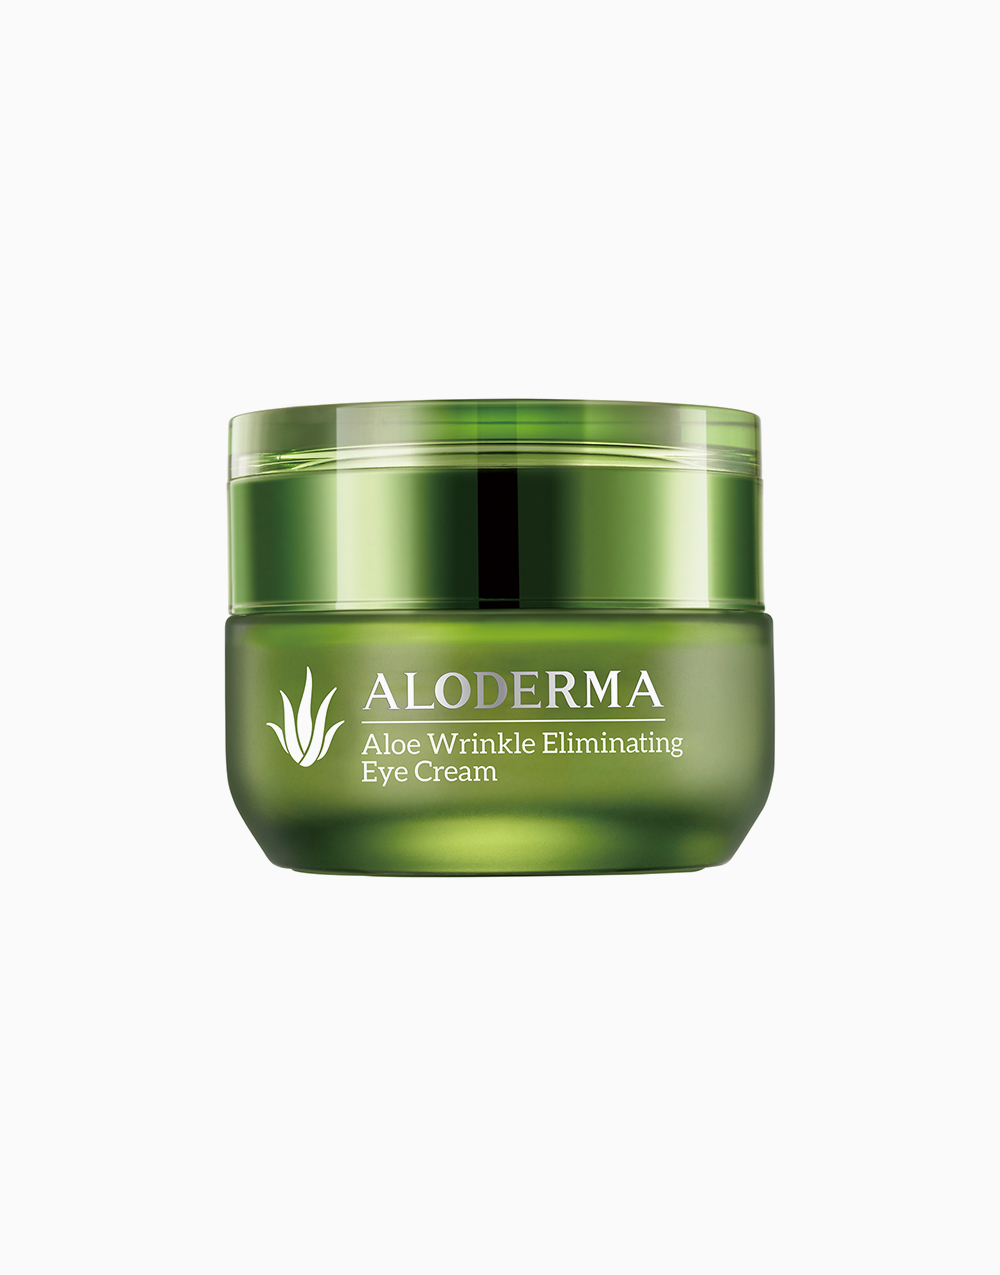 Wrinkle Eliminating Eye Cream by Aloderma